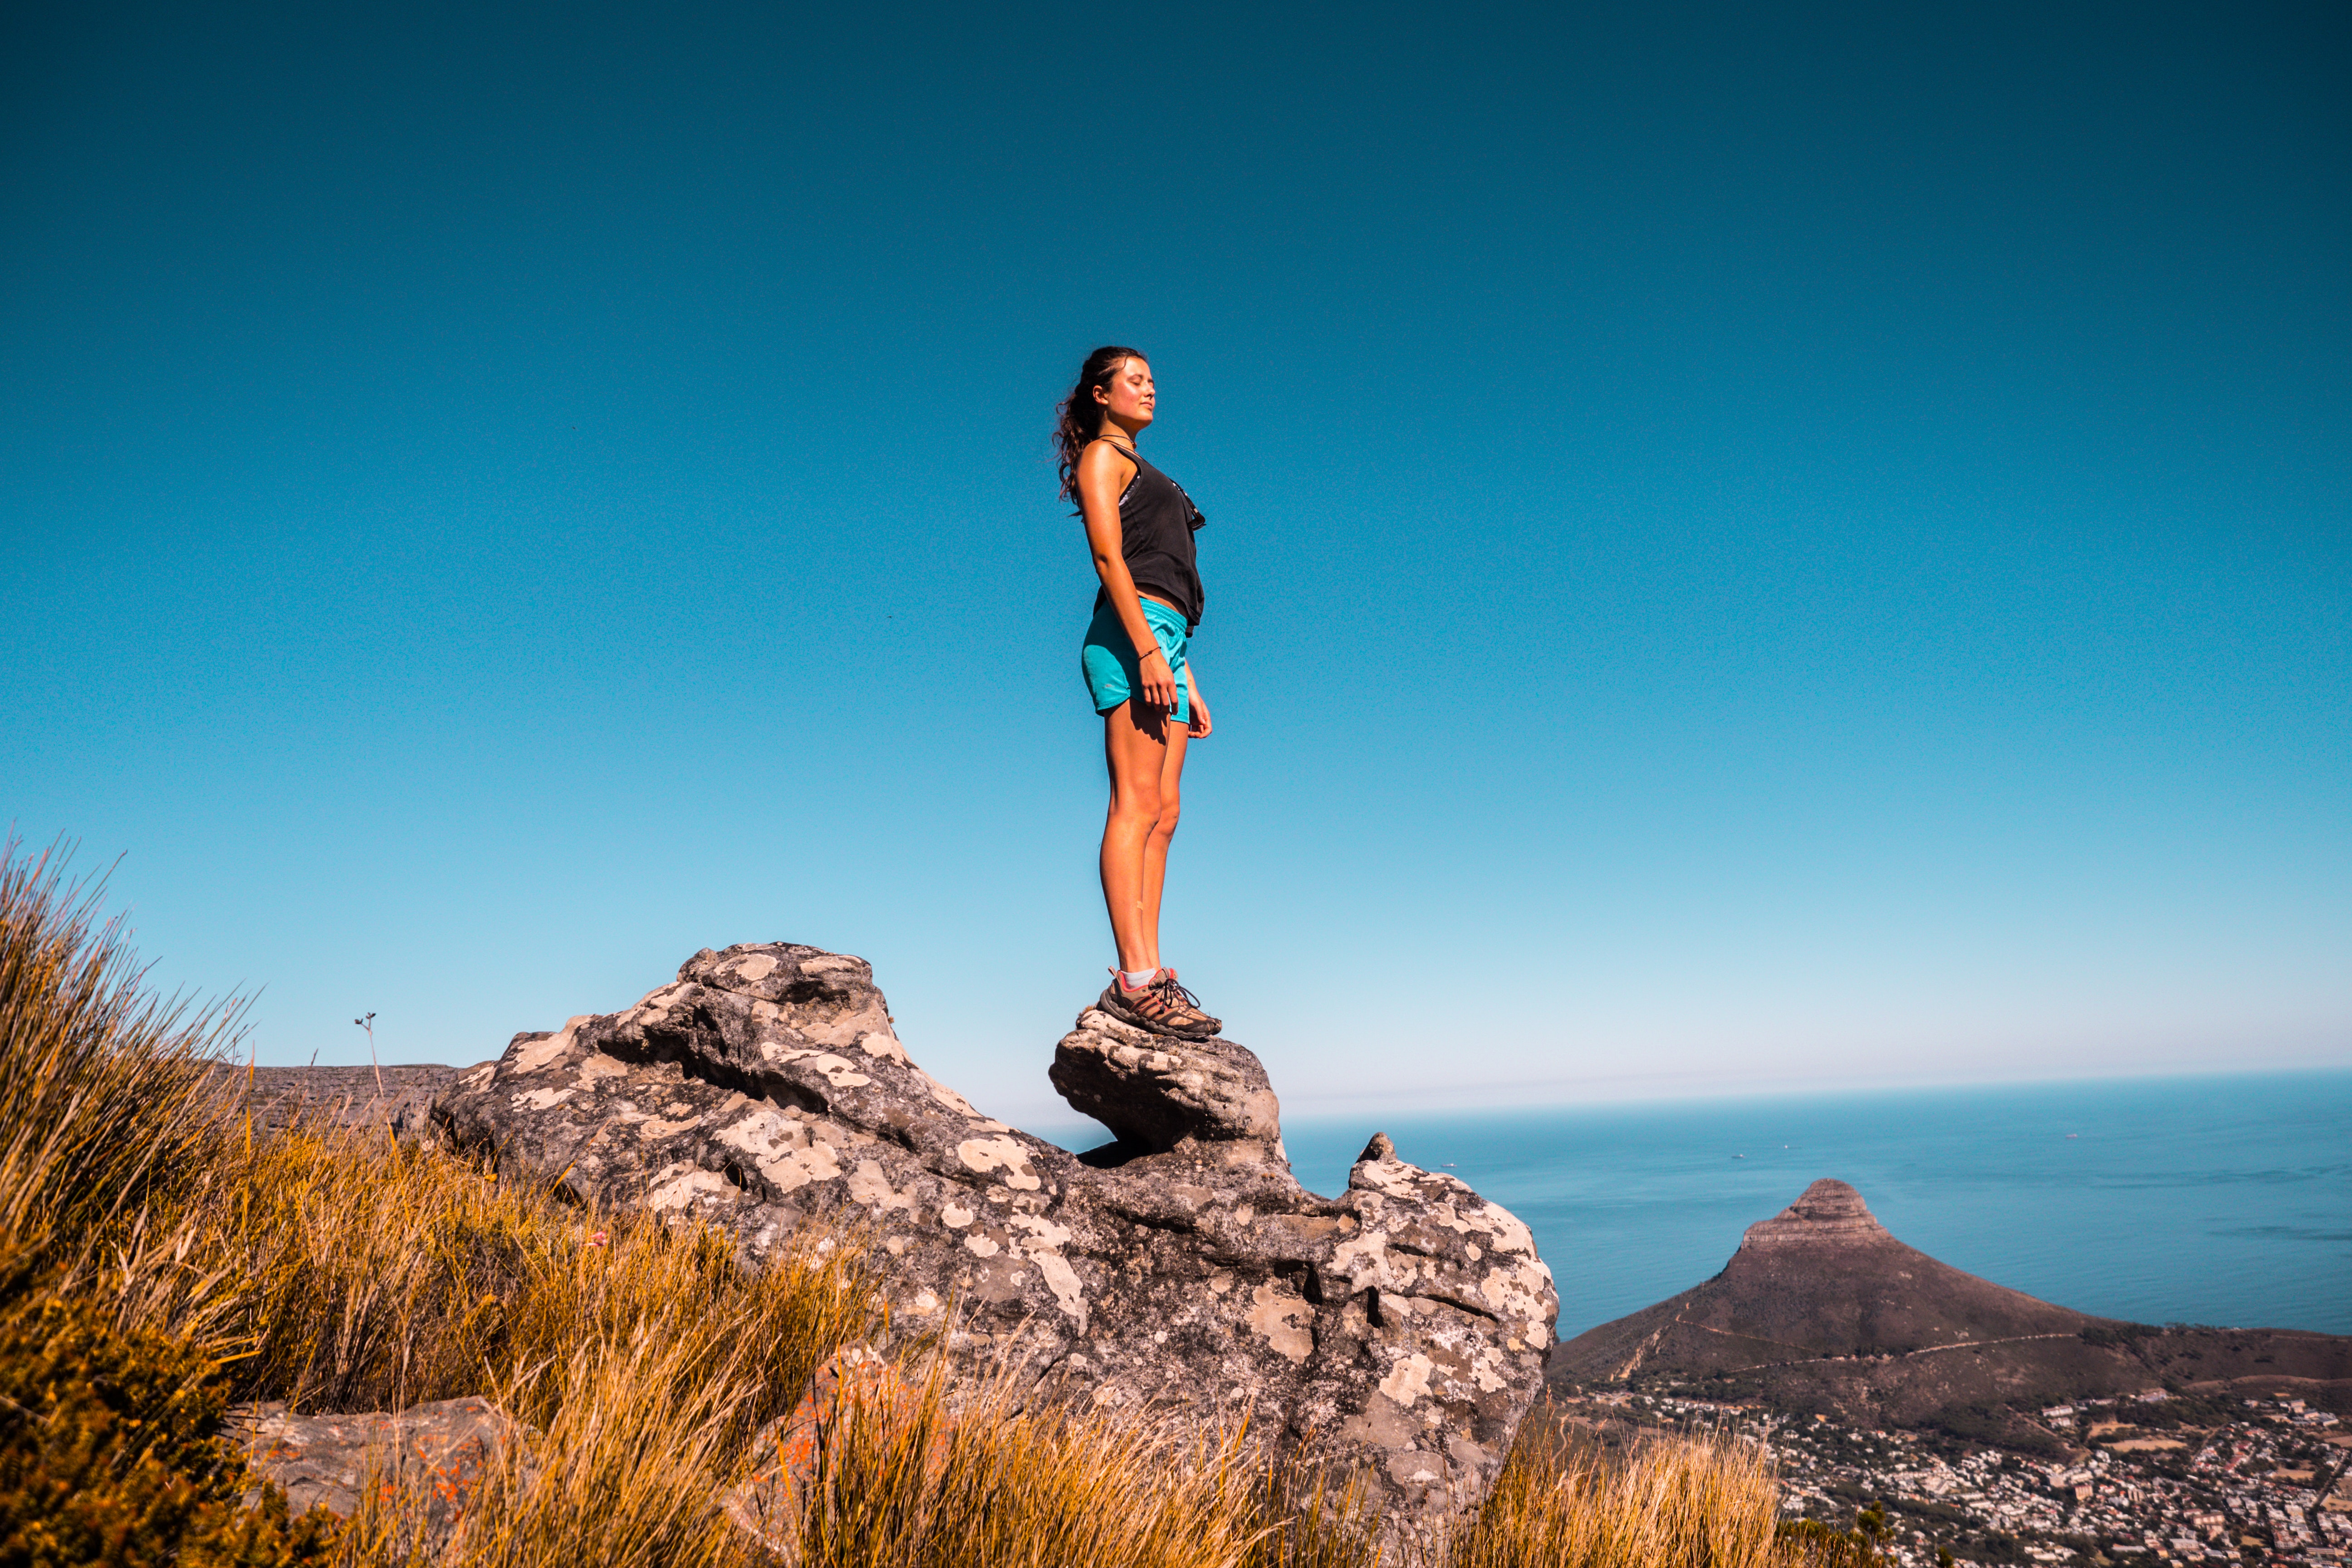 5 travel hacks for hiking   Travel Guide   Elle Blonde Luxury Lifestyle Destination Blog